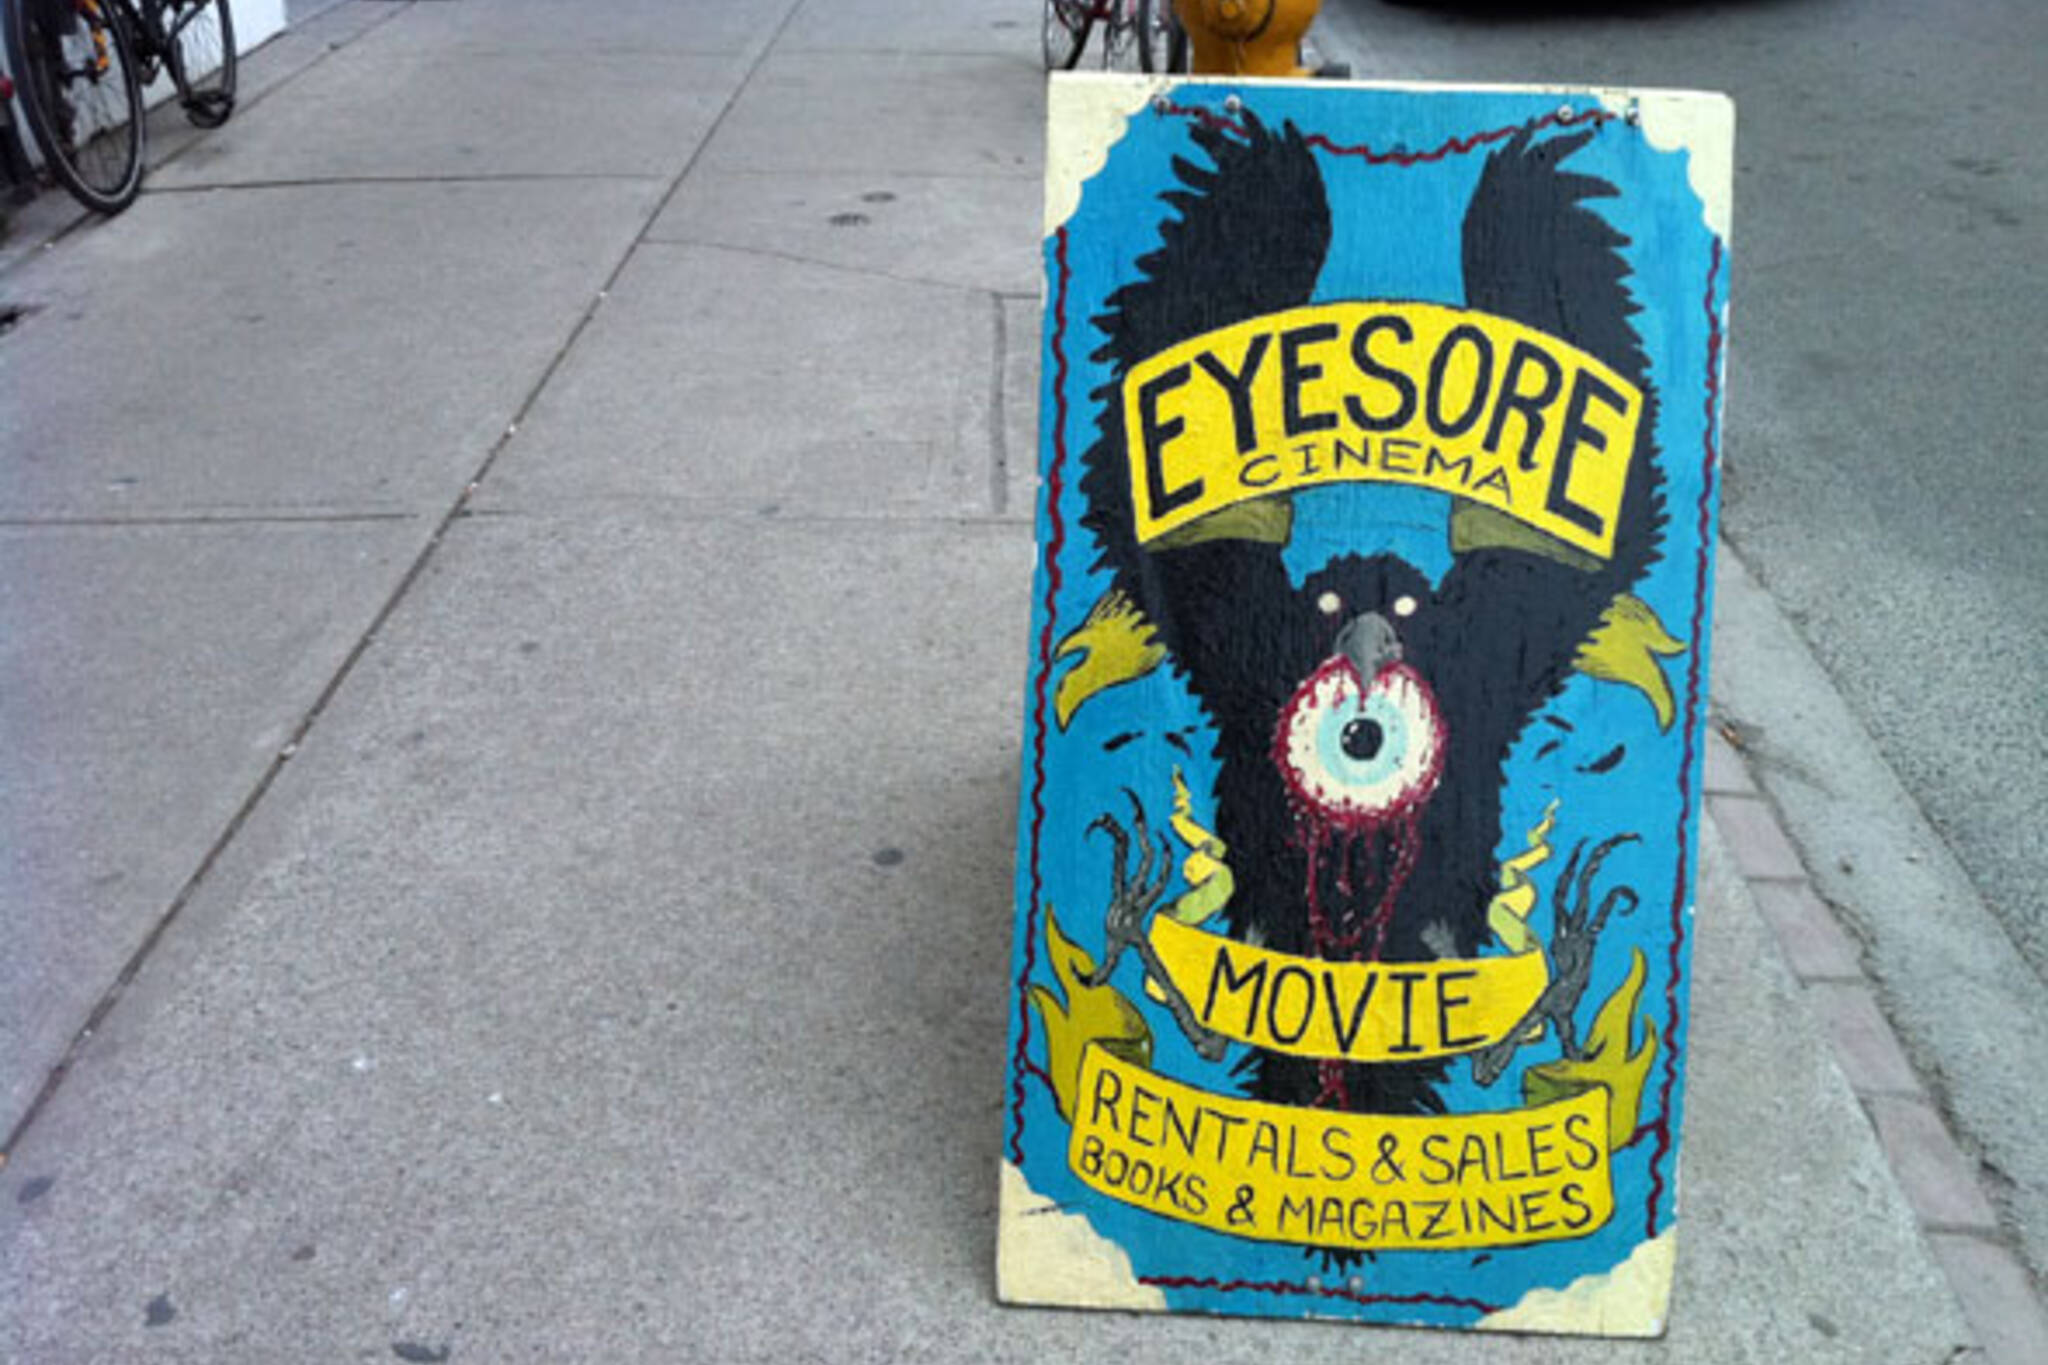 Eyesore cinema toronto